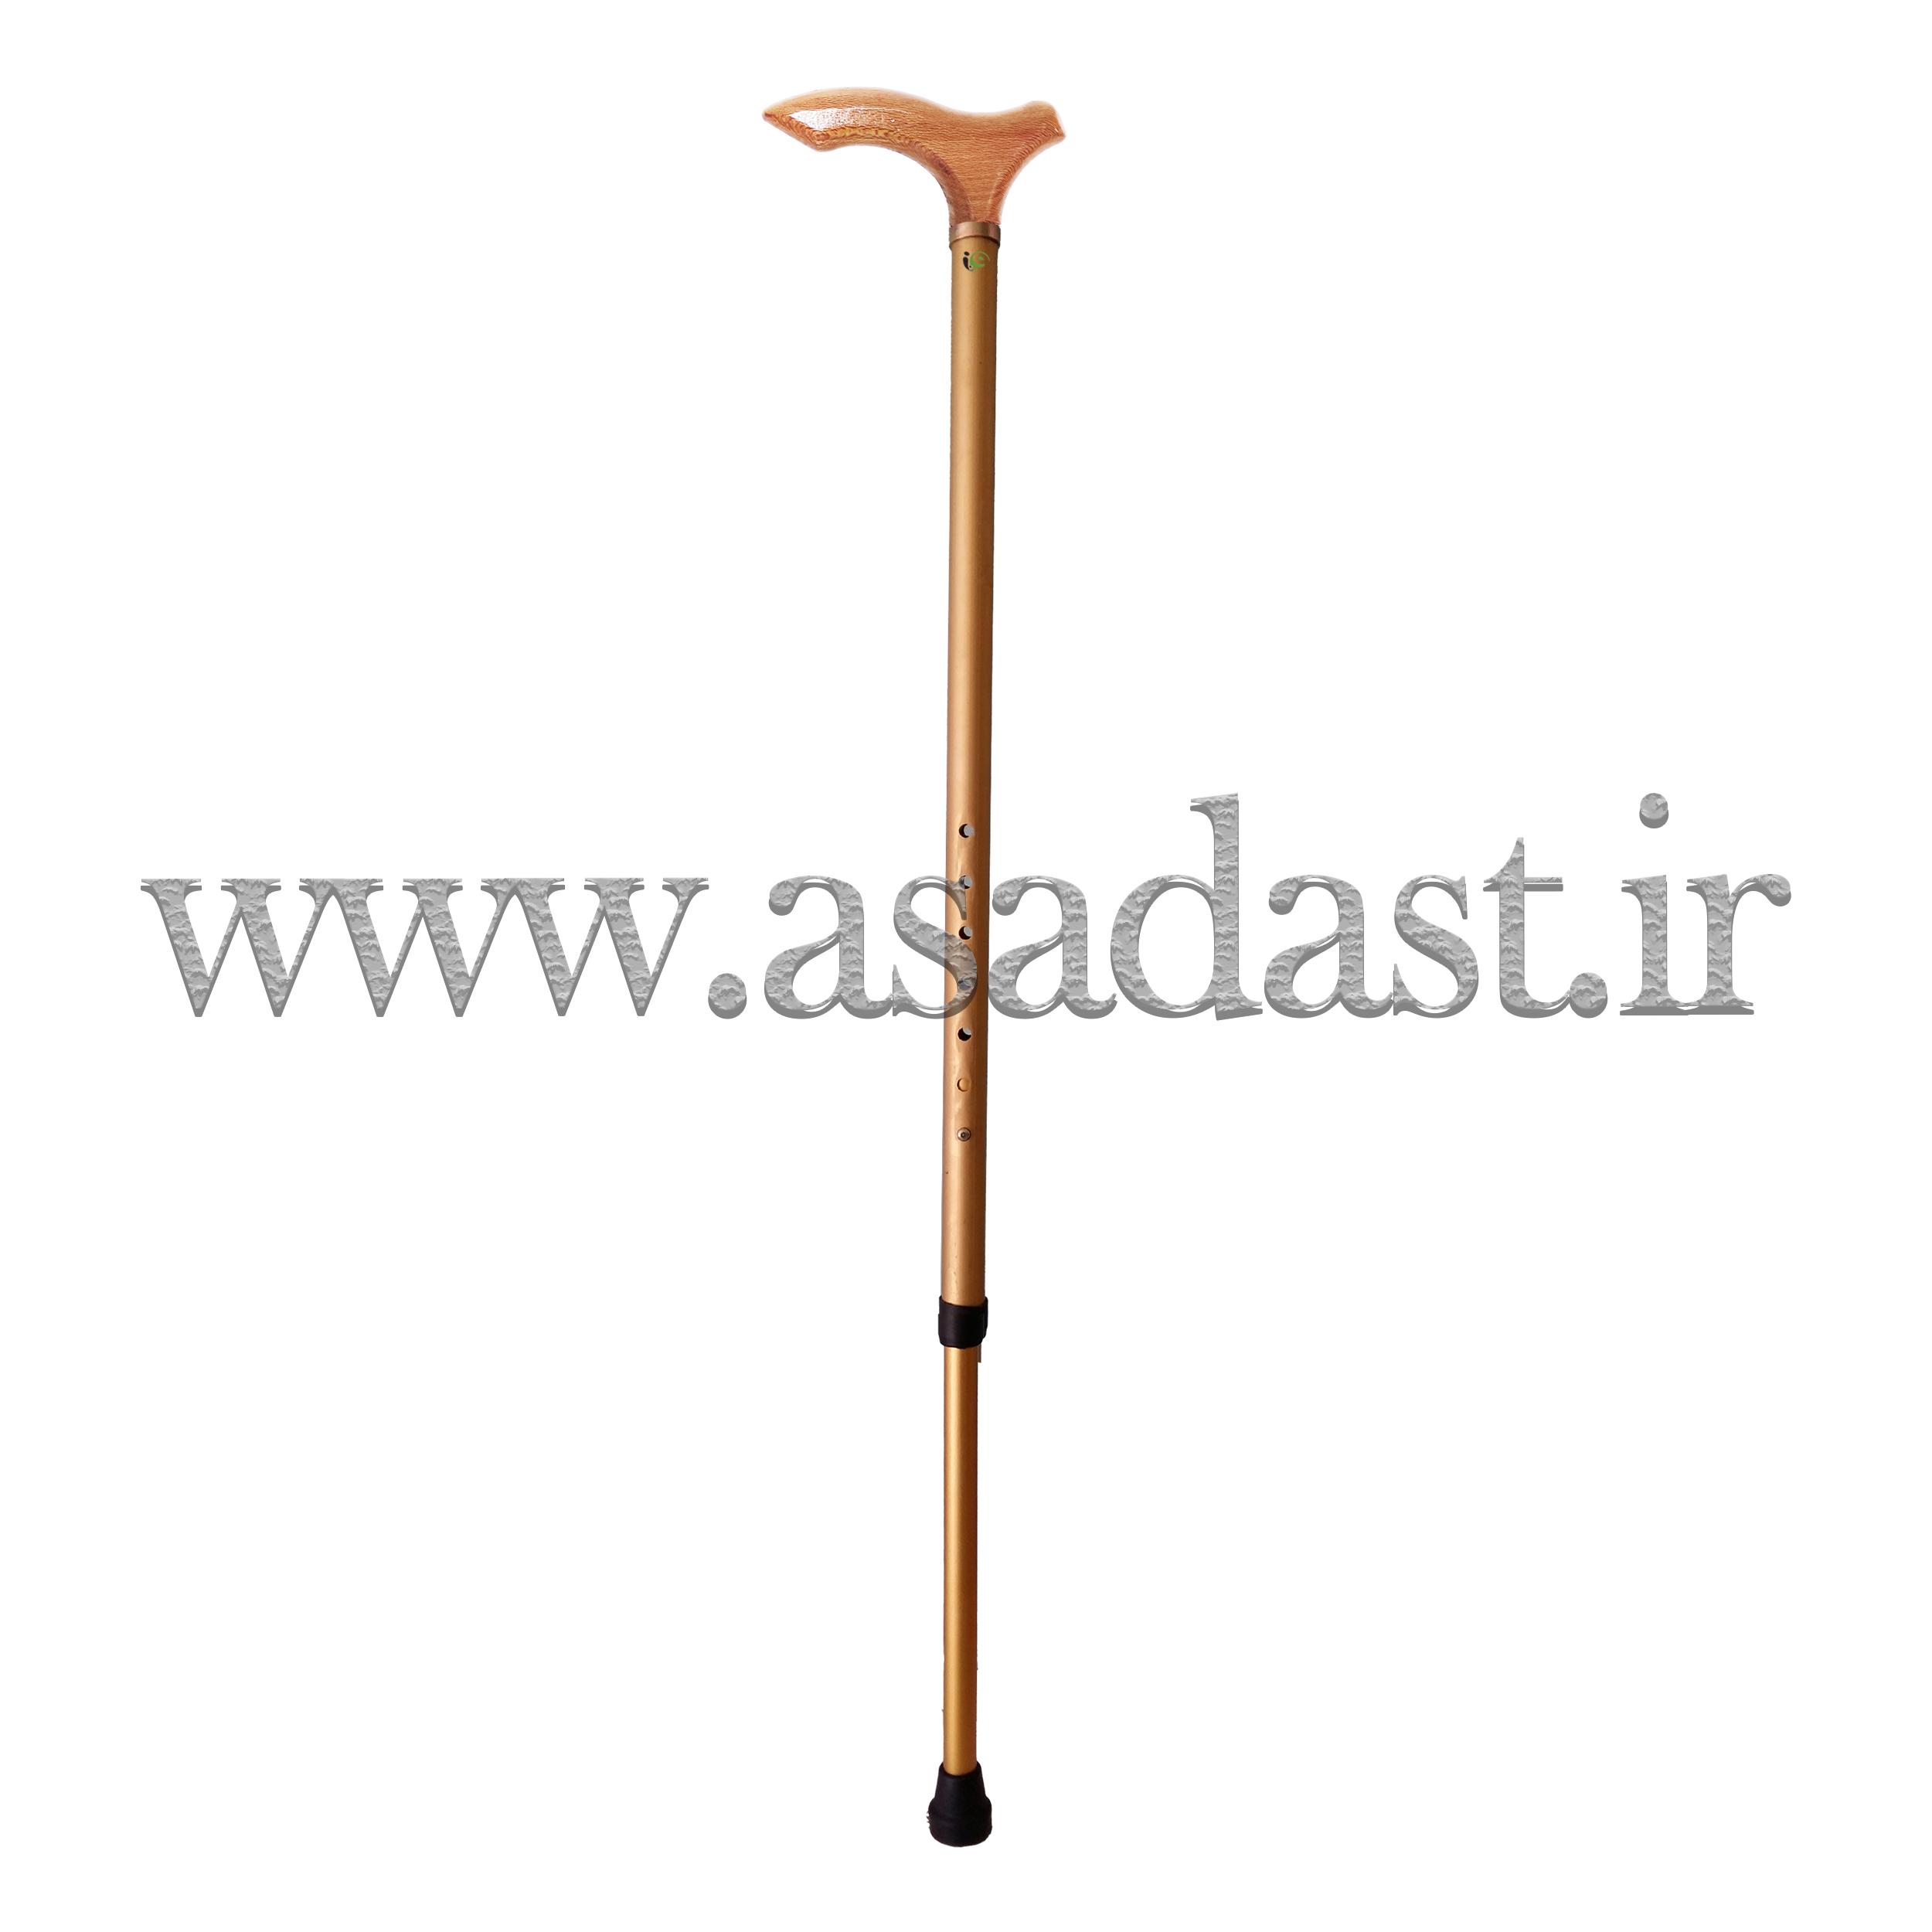 عصای آلومینیومی دسته چوبی قابل تنظیم مدل 1-1023